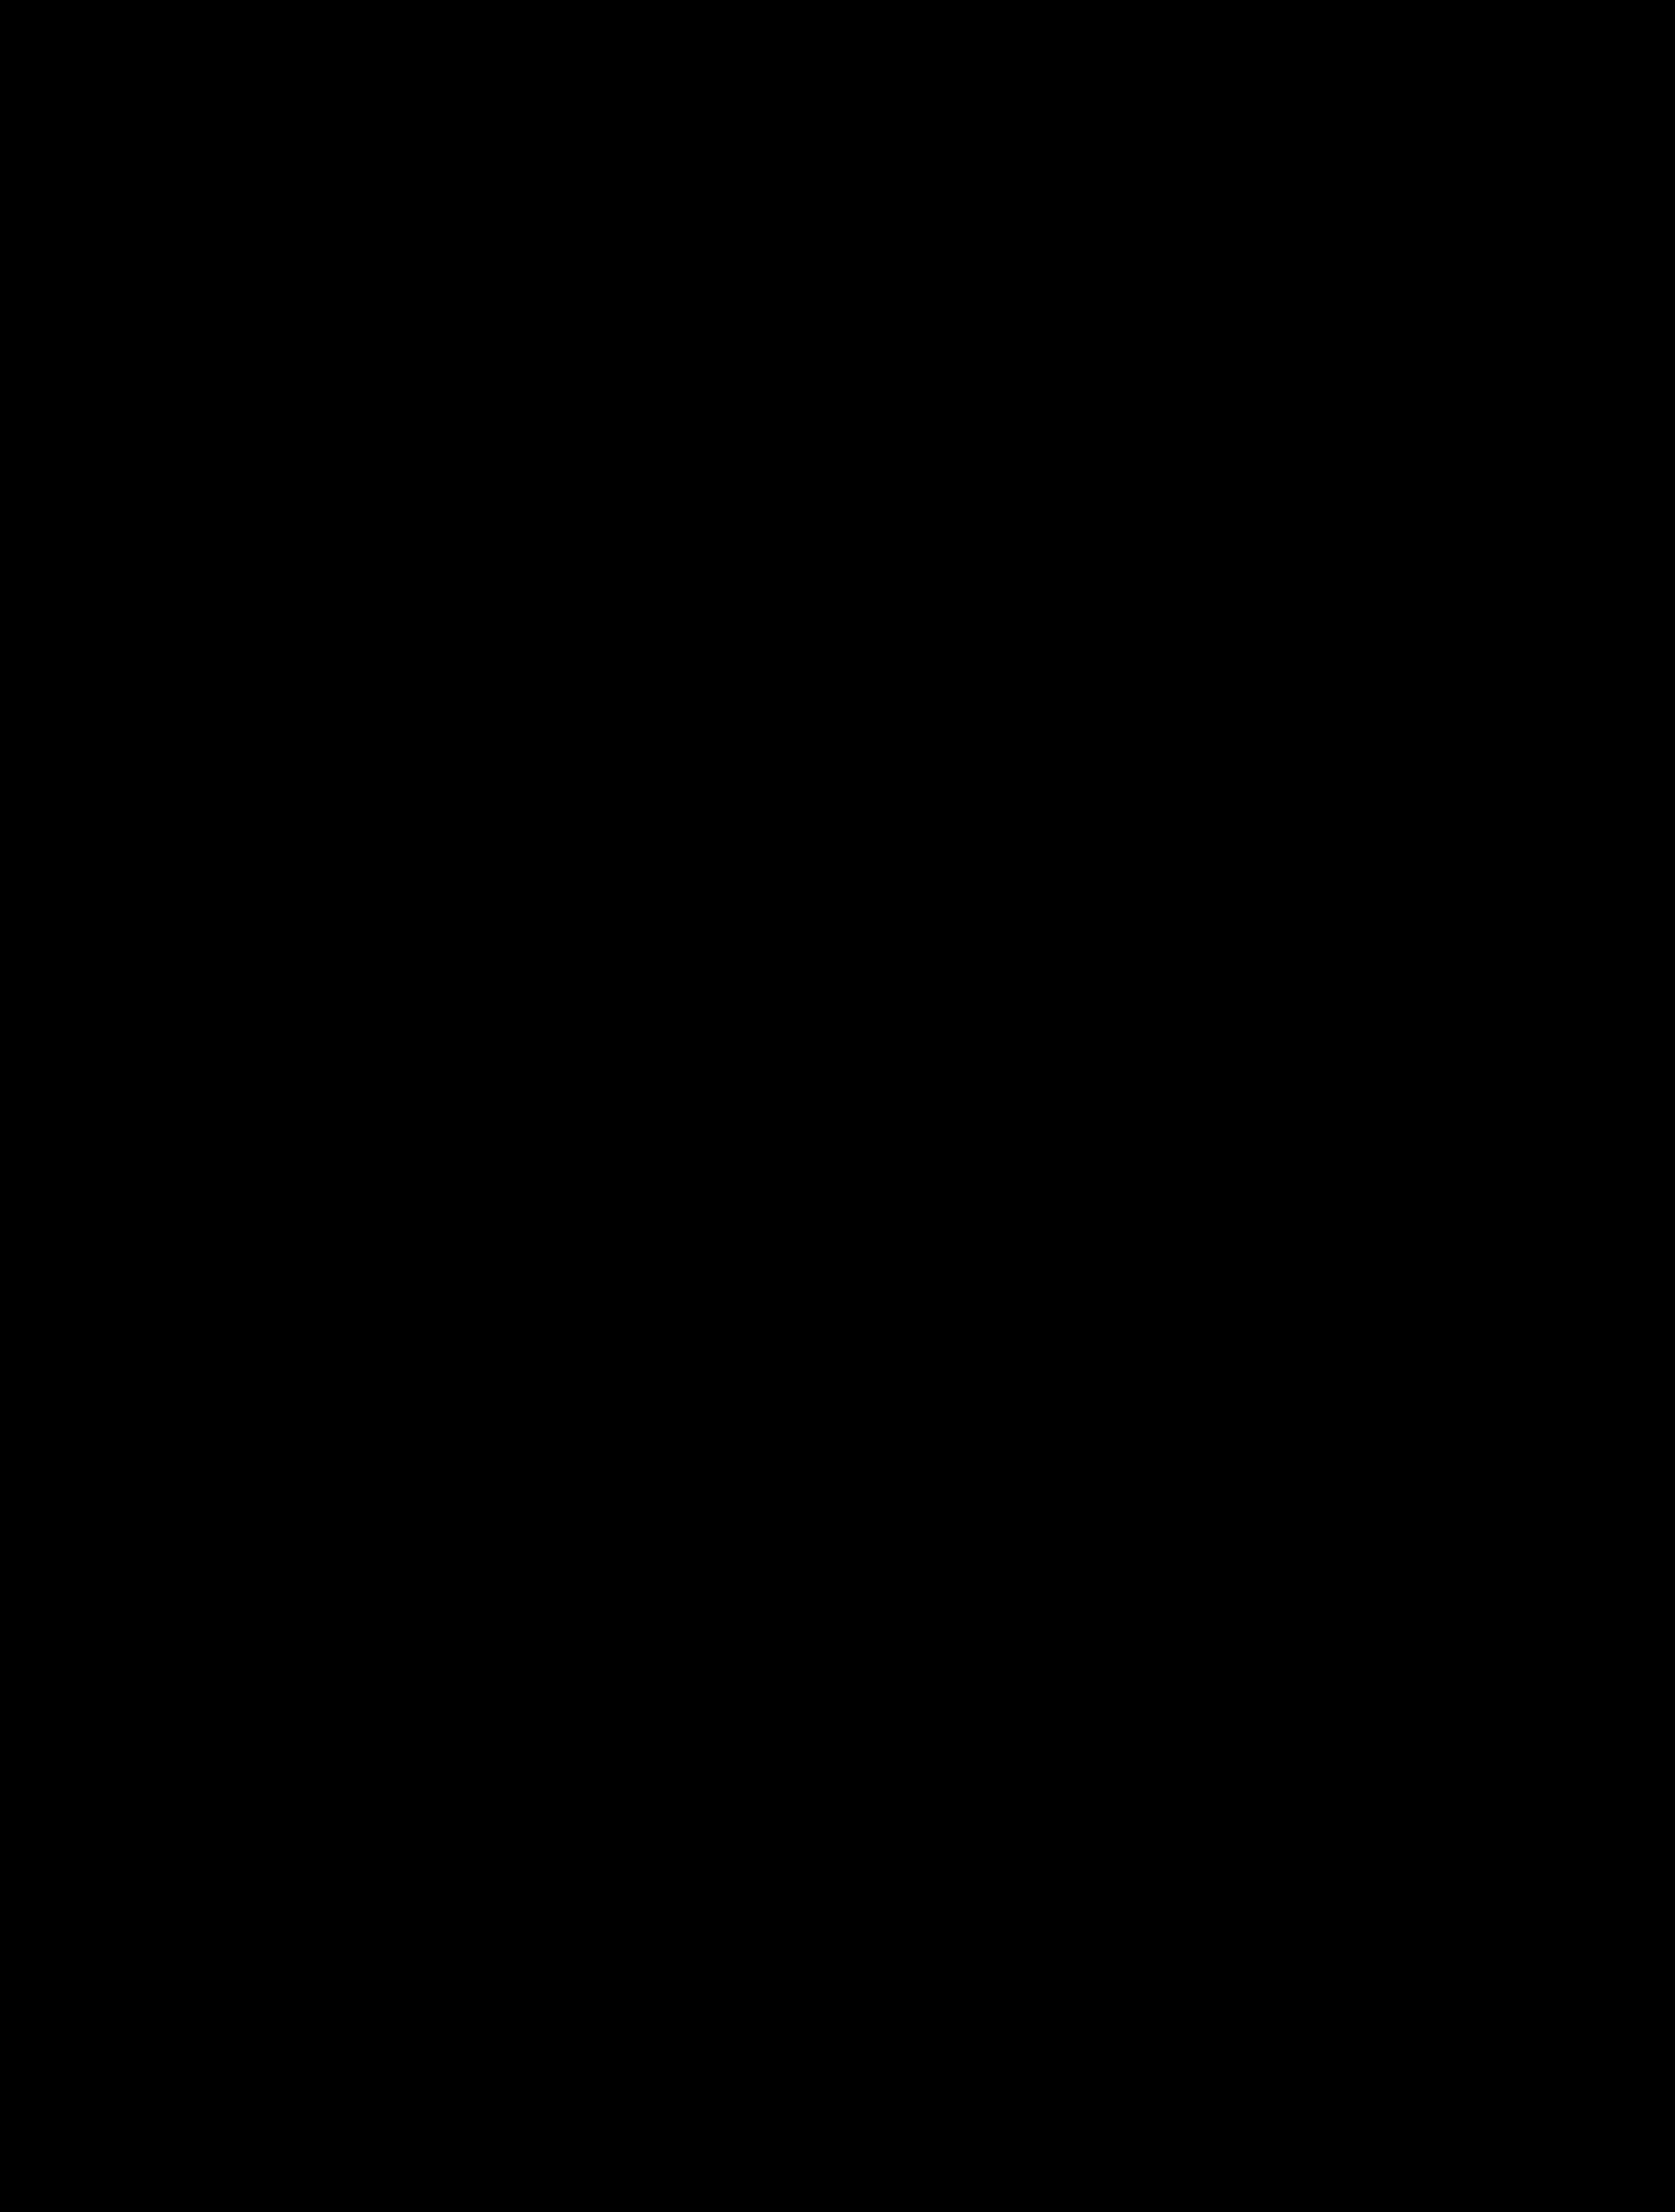 Cartoon Drawing Of The Odysseus